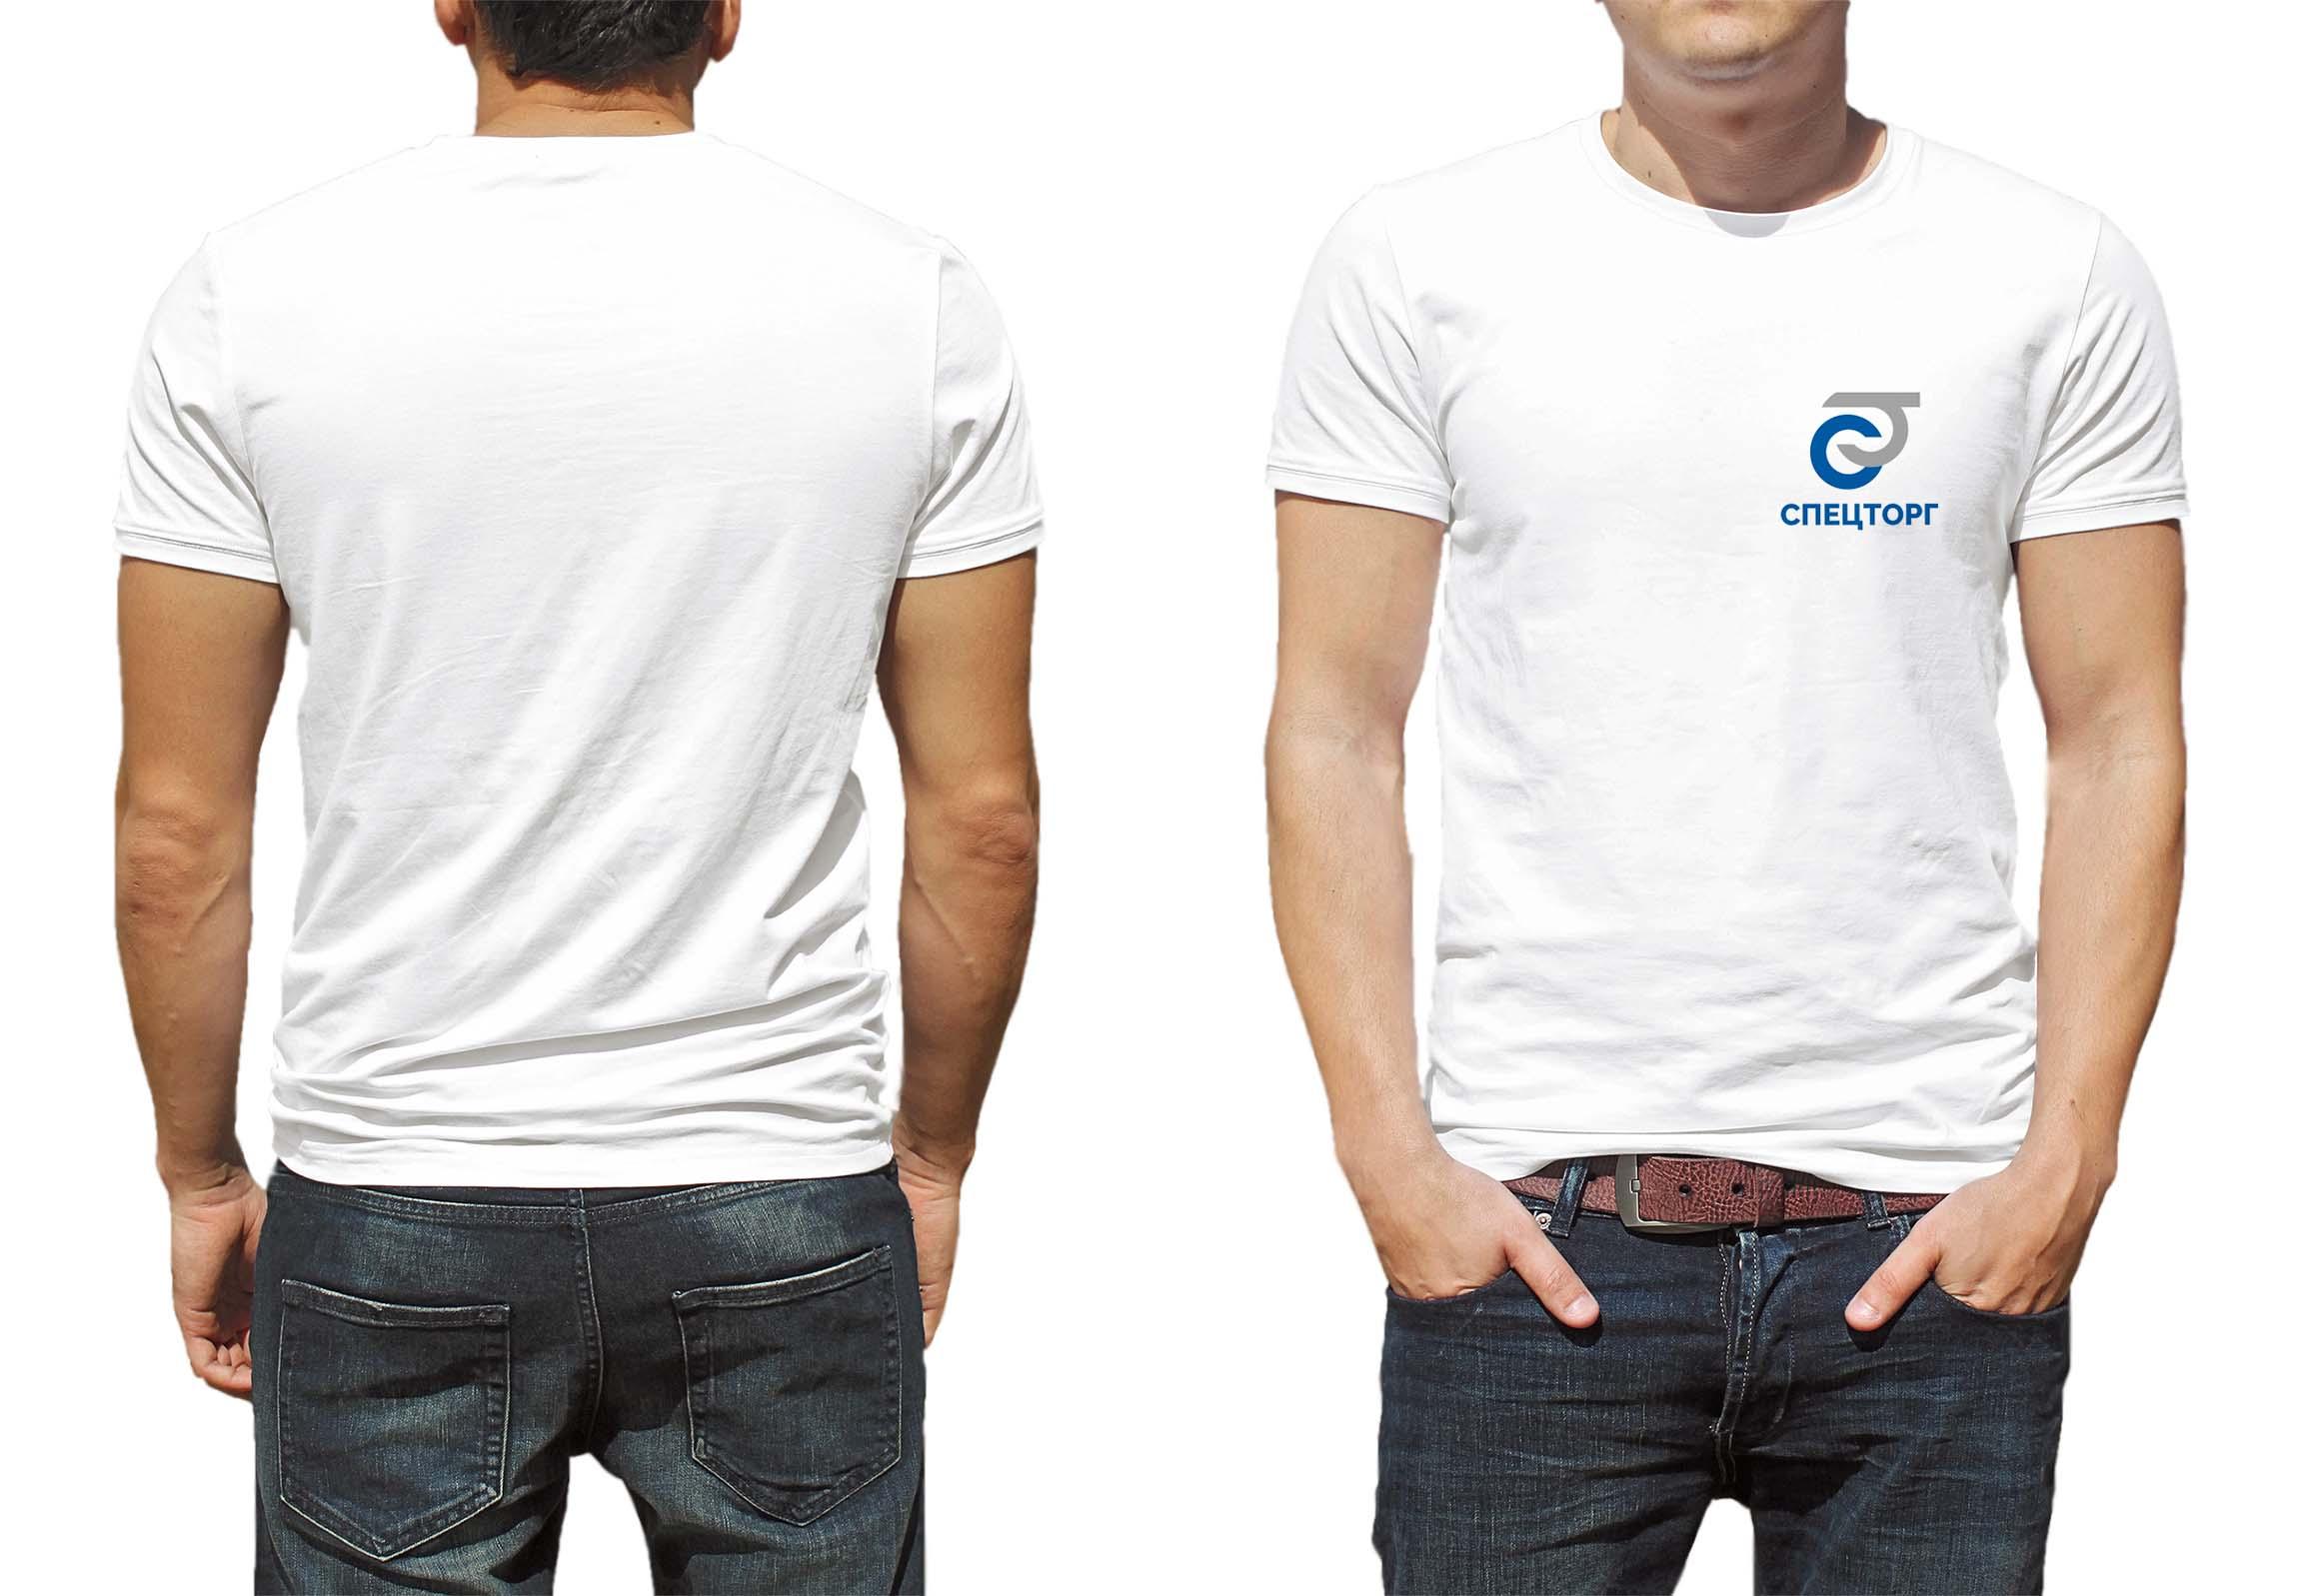 Разработать дизайн  логотипа компании фото f_9415dc2eadcaa196.jpg